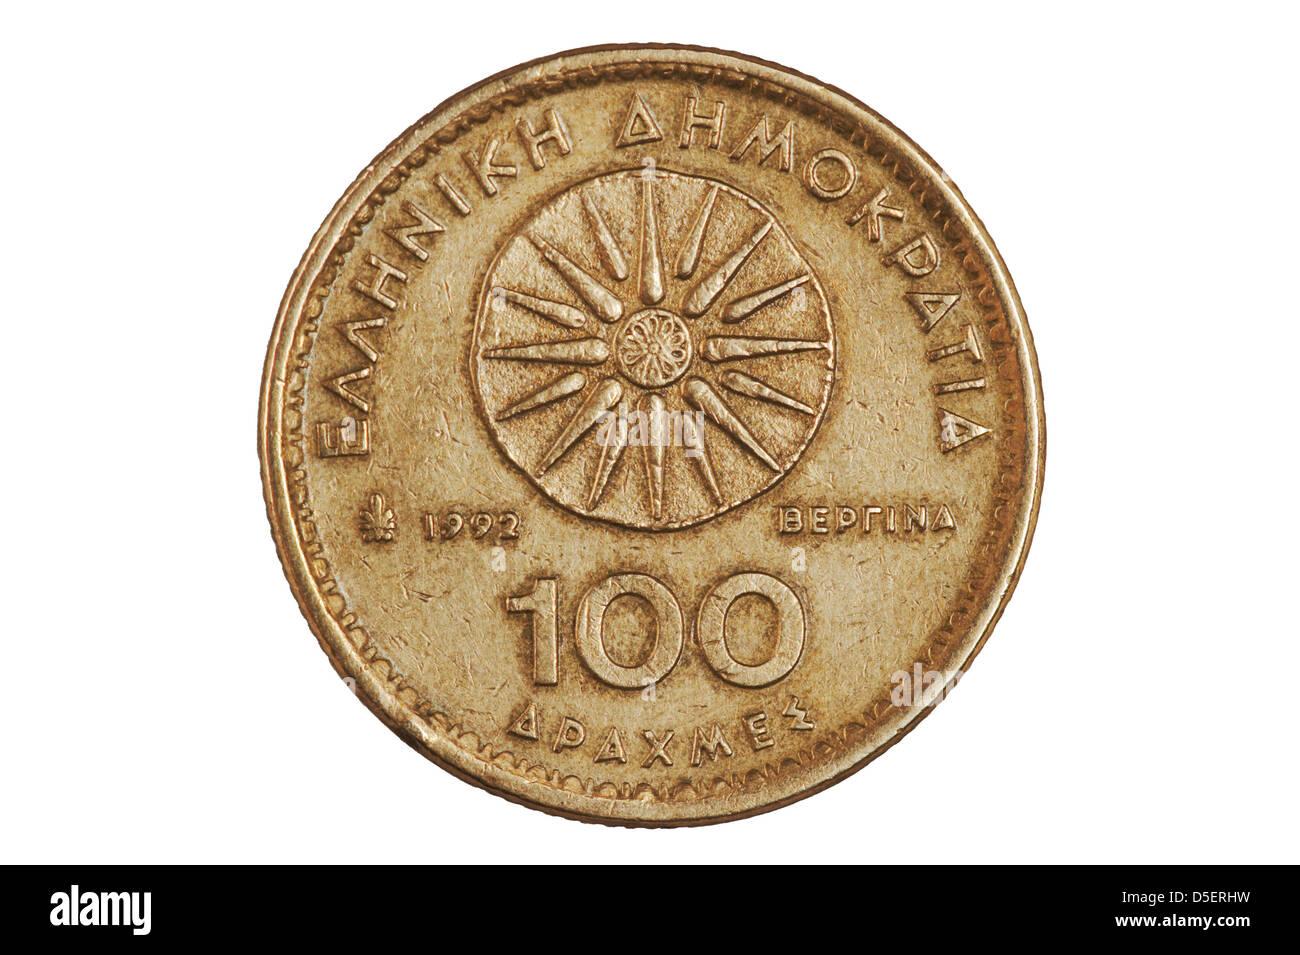 100 Greek drachmas coin - reverse. - Stock Image